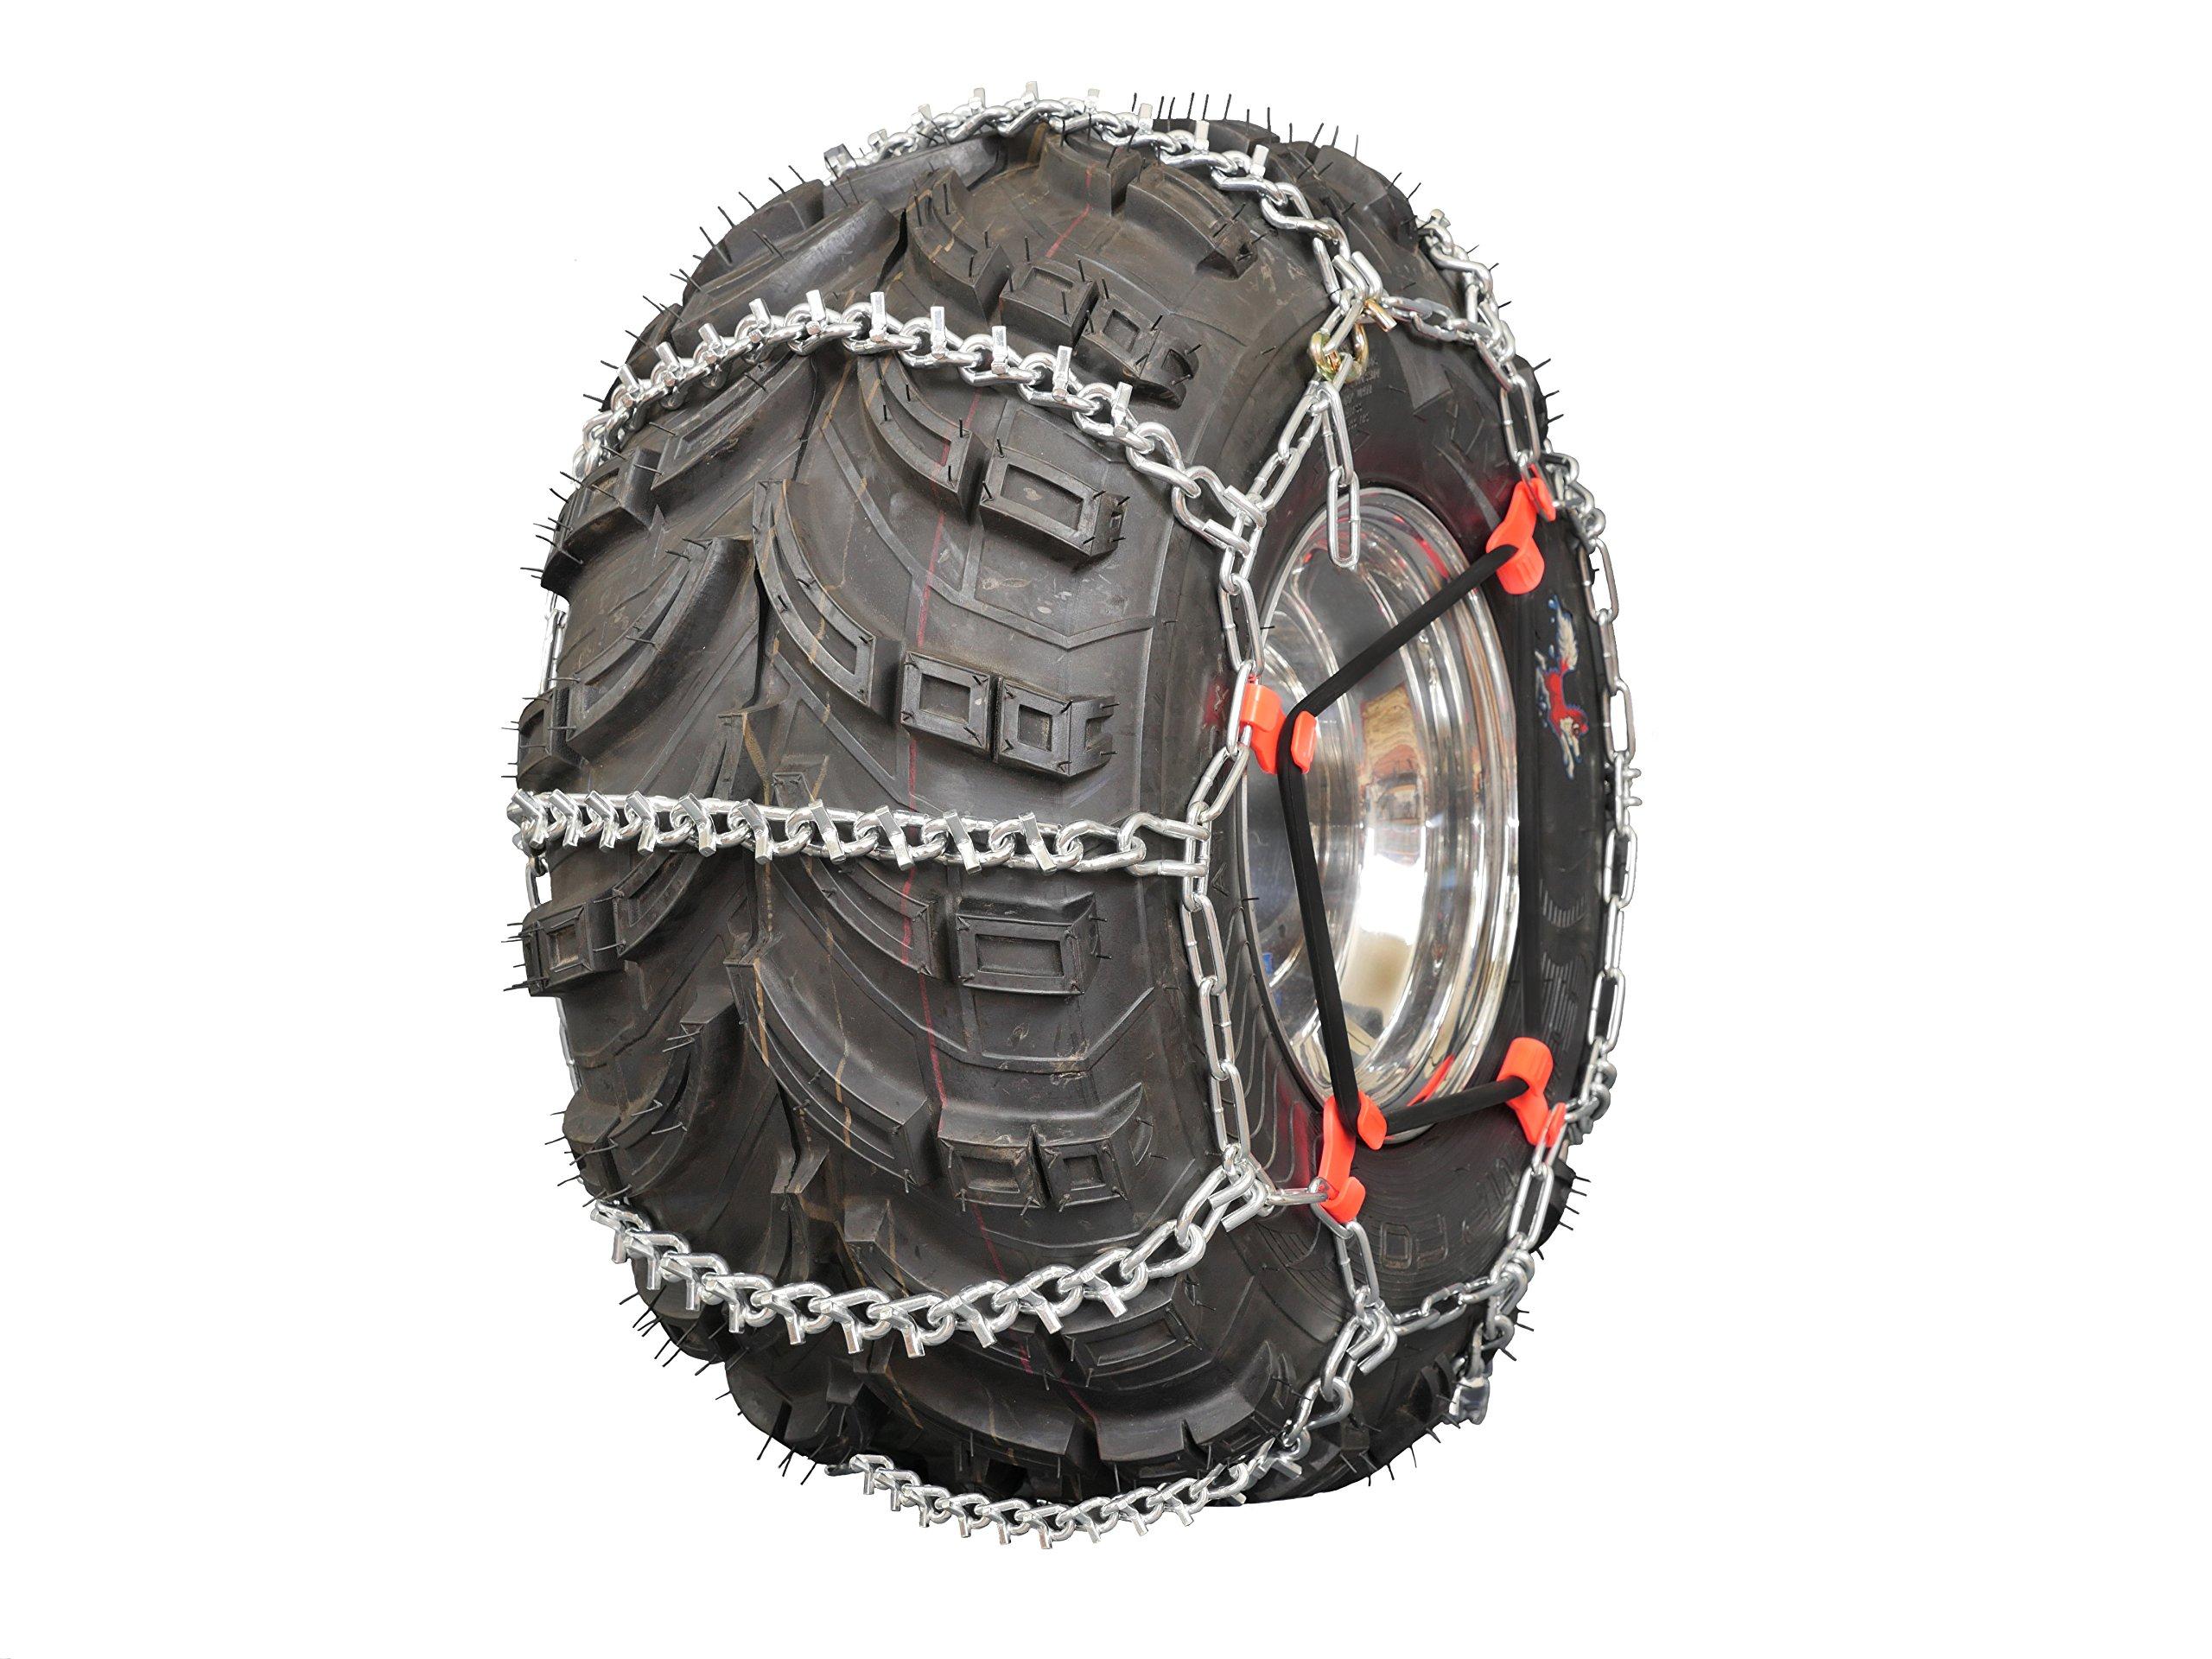 Grizzlar GTU-617 ATV 4 Link Ladder Alloy Tire Chains with Tensioners 24x13-9 25x10-10 25x10-12 25x11-10 25x10.5-15 25x12-9 25x12-10 by Grizzlar